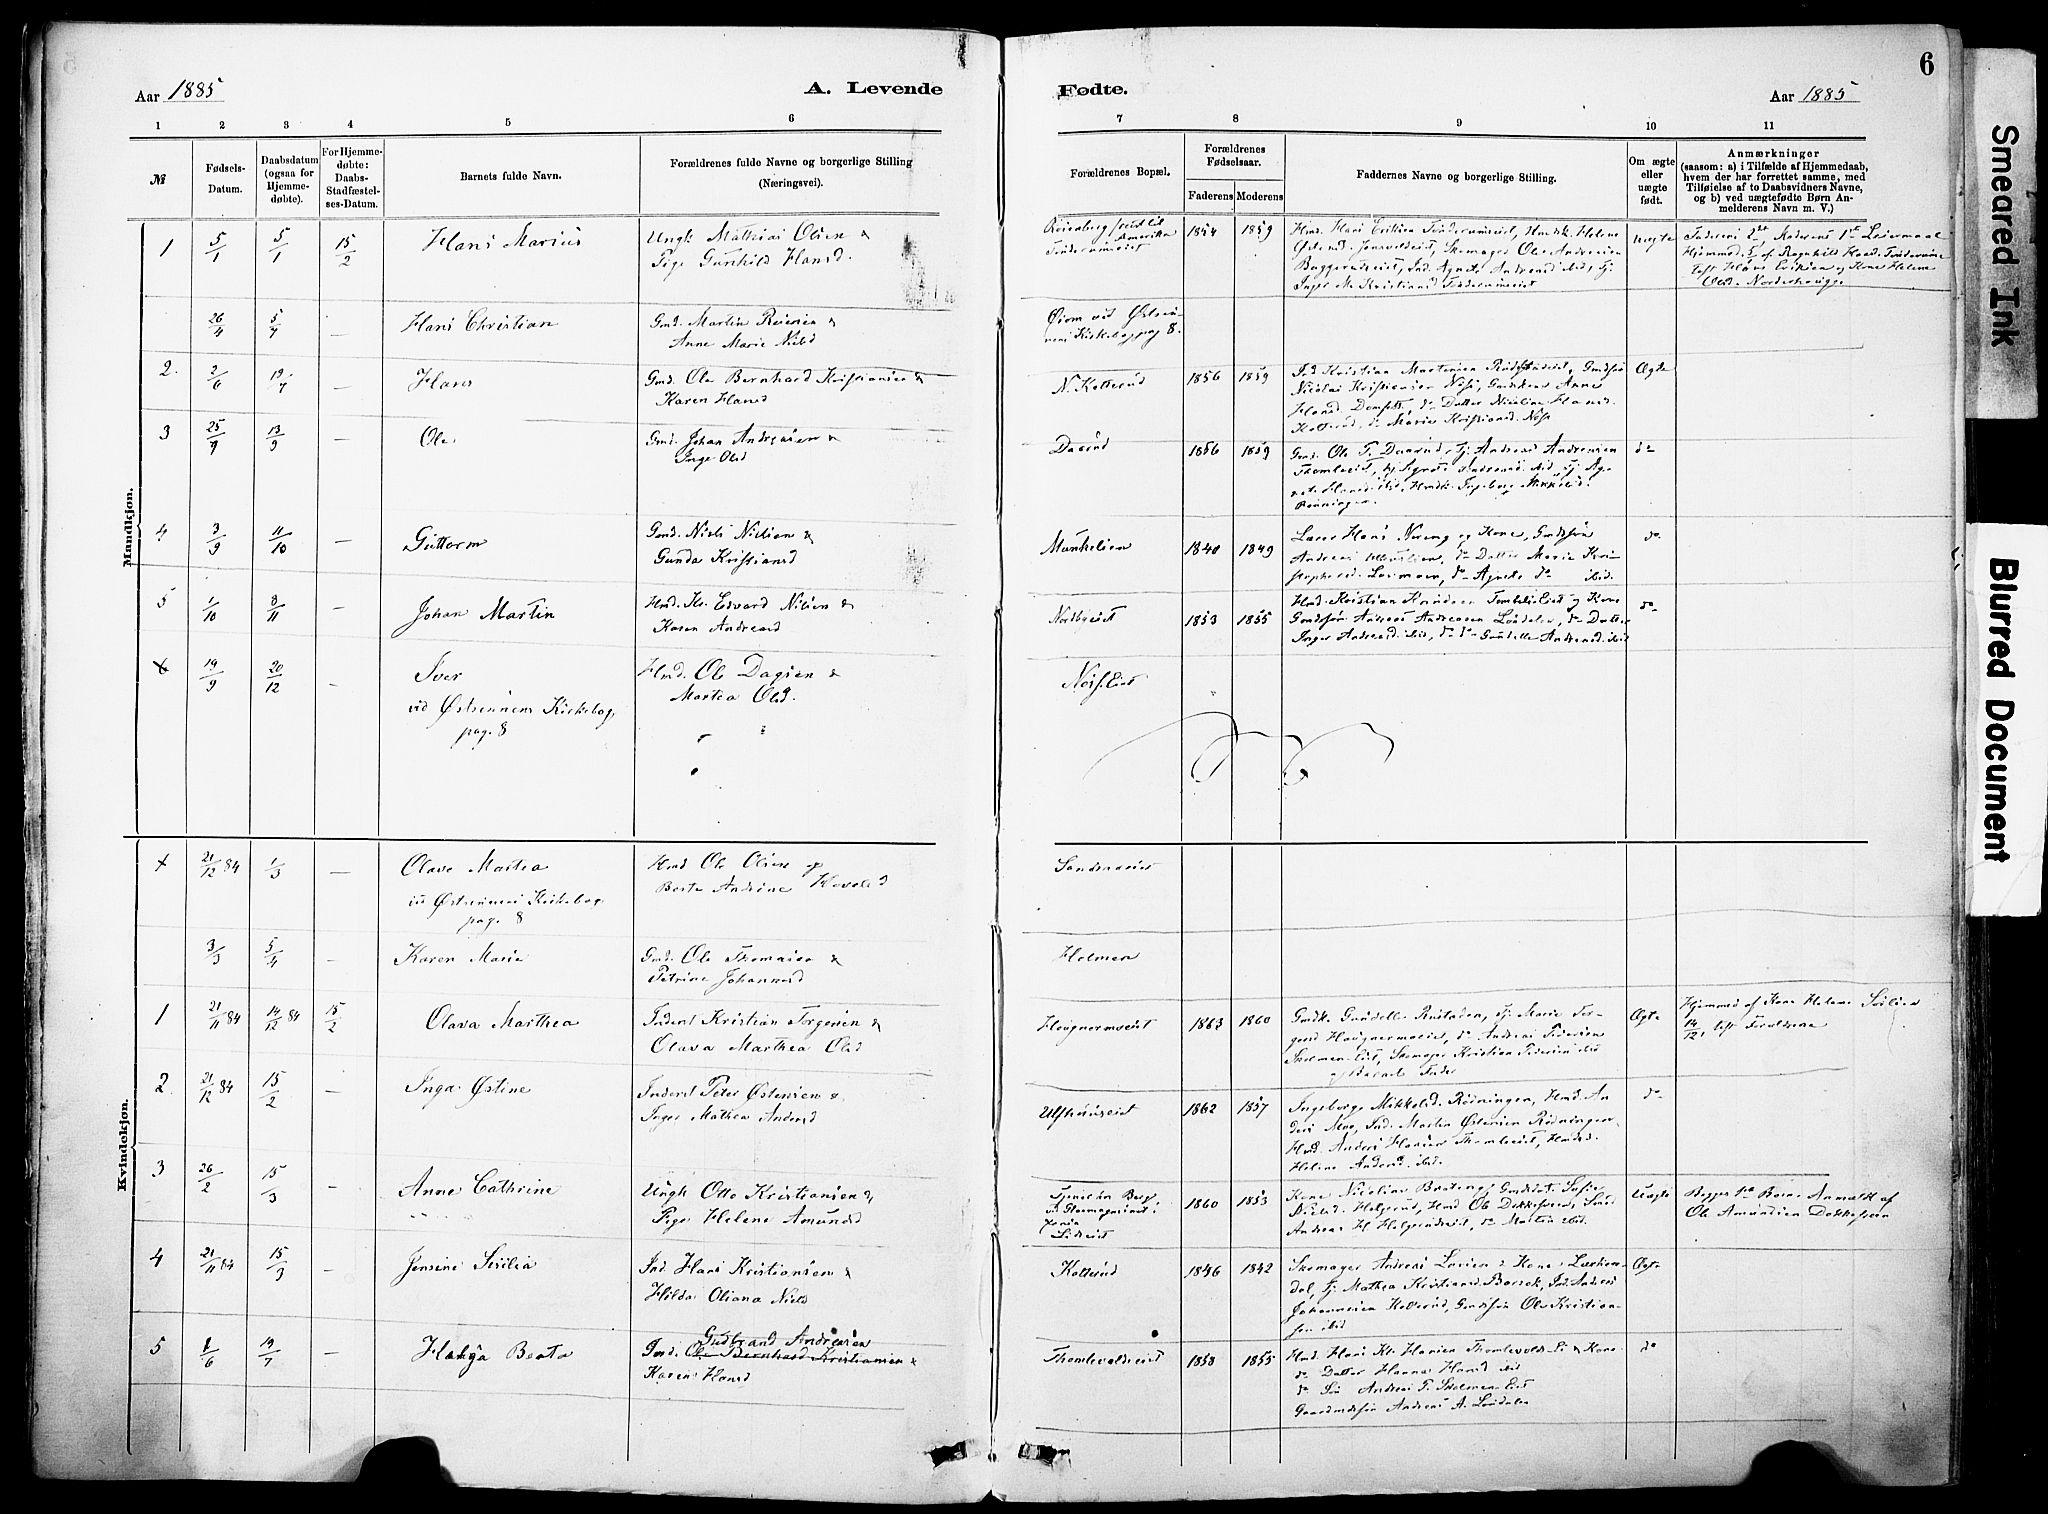 SAH, Nordre Land prestekontor, Ministerialbok nr. 5, 1882-1903, s. 6